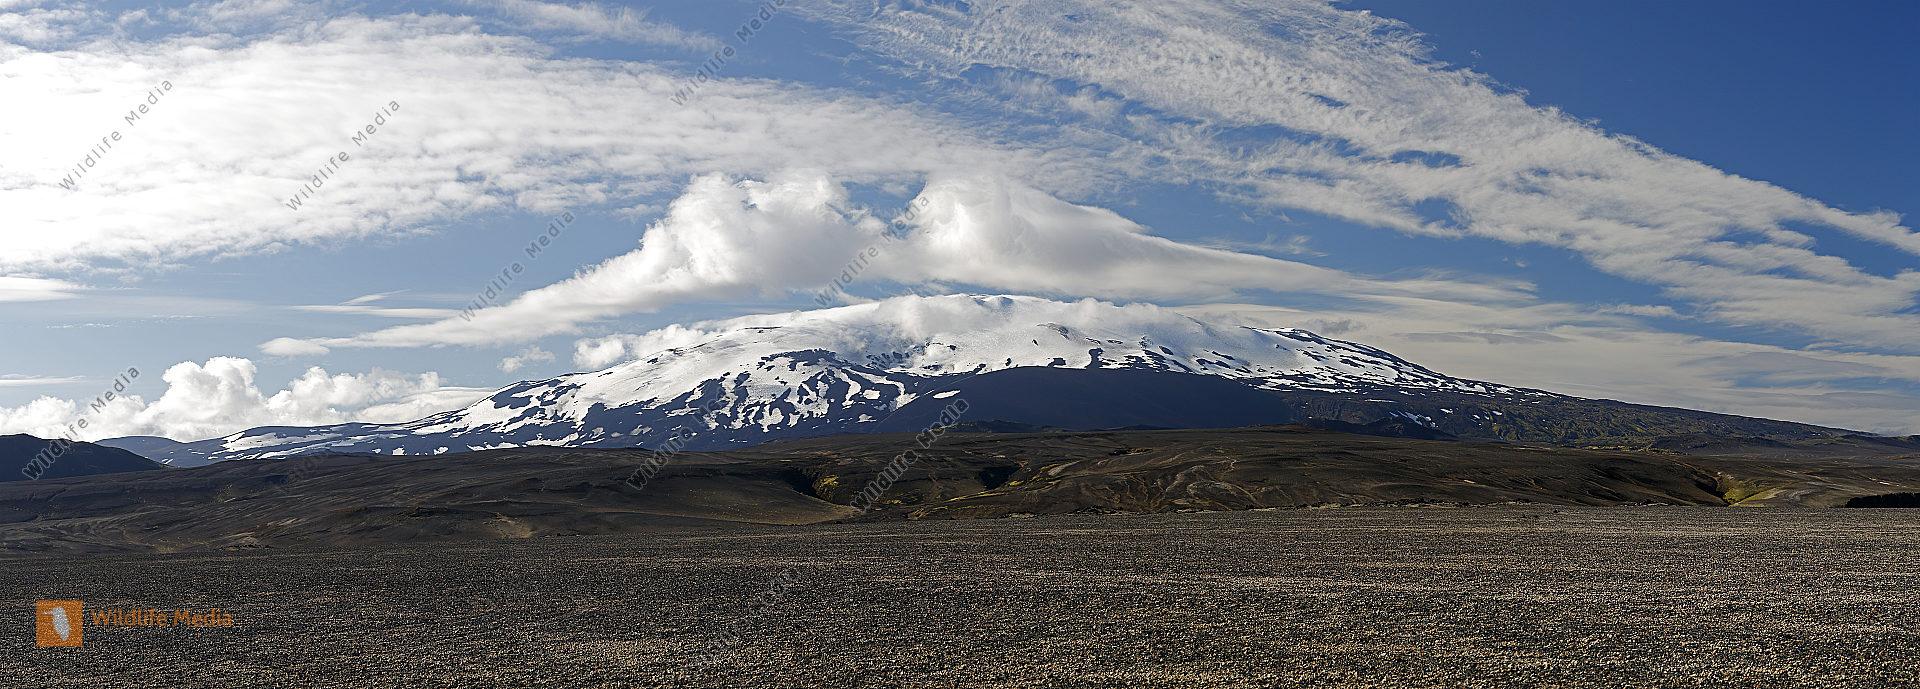 Hekla Vulkan mit Lavafeldern